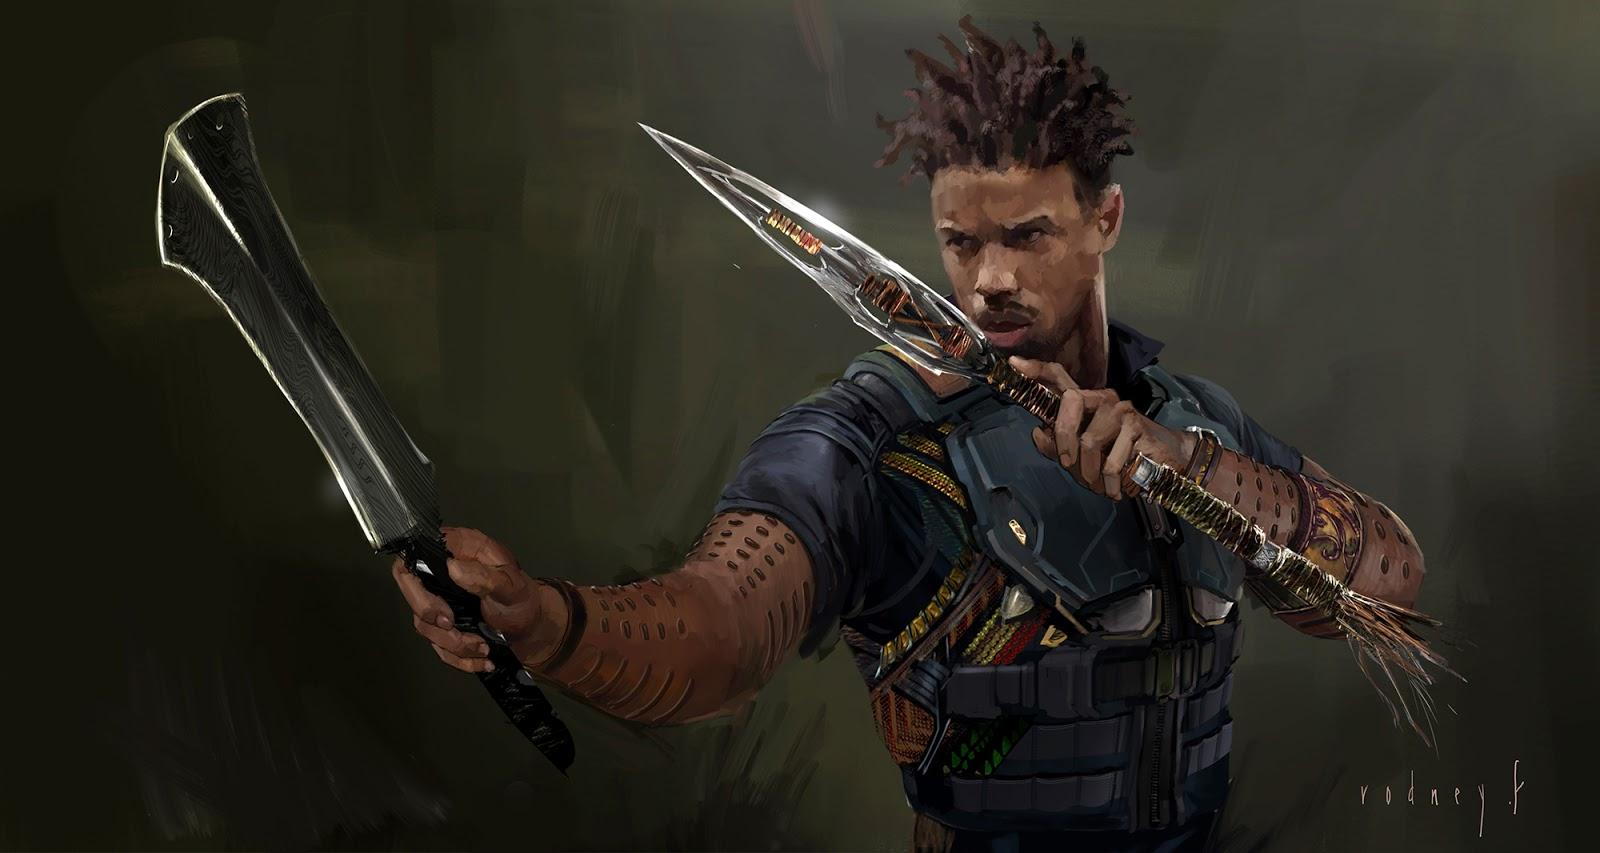 Black Panther Concept Art Rodney Fuentebella Erik Killmonger